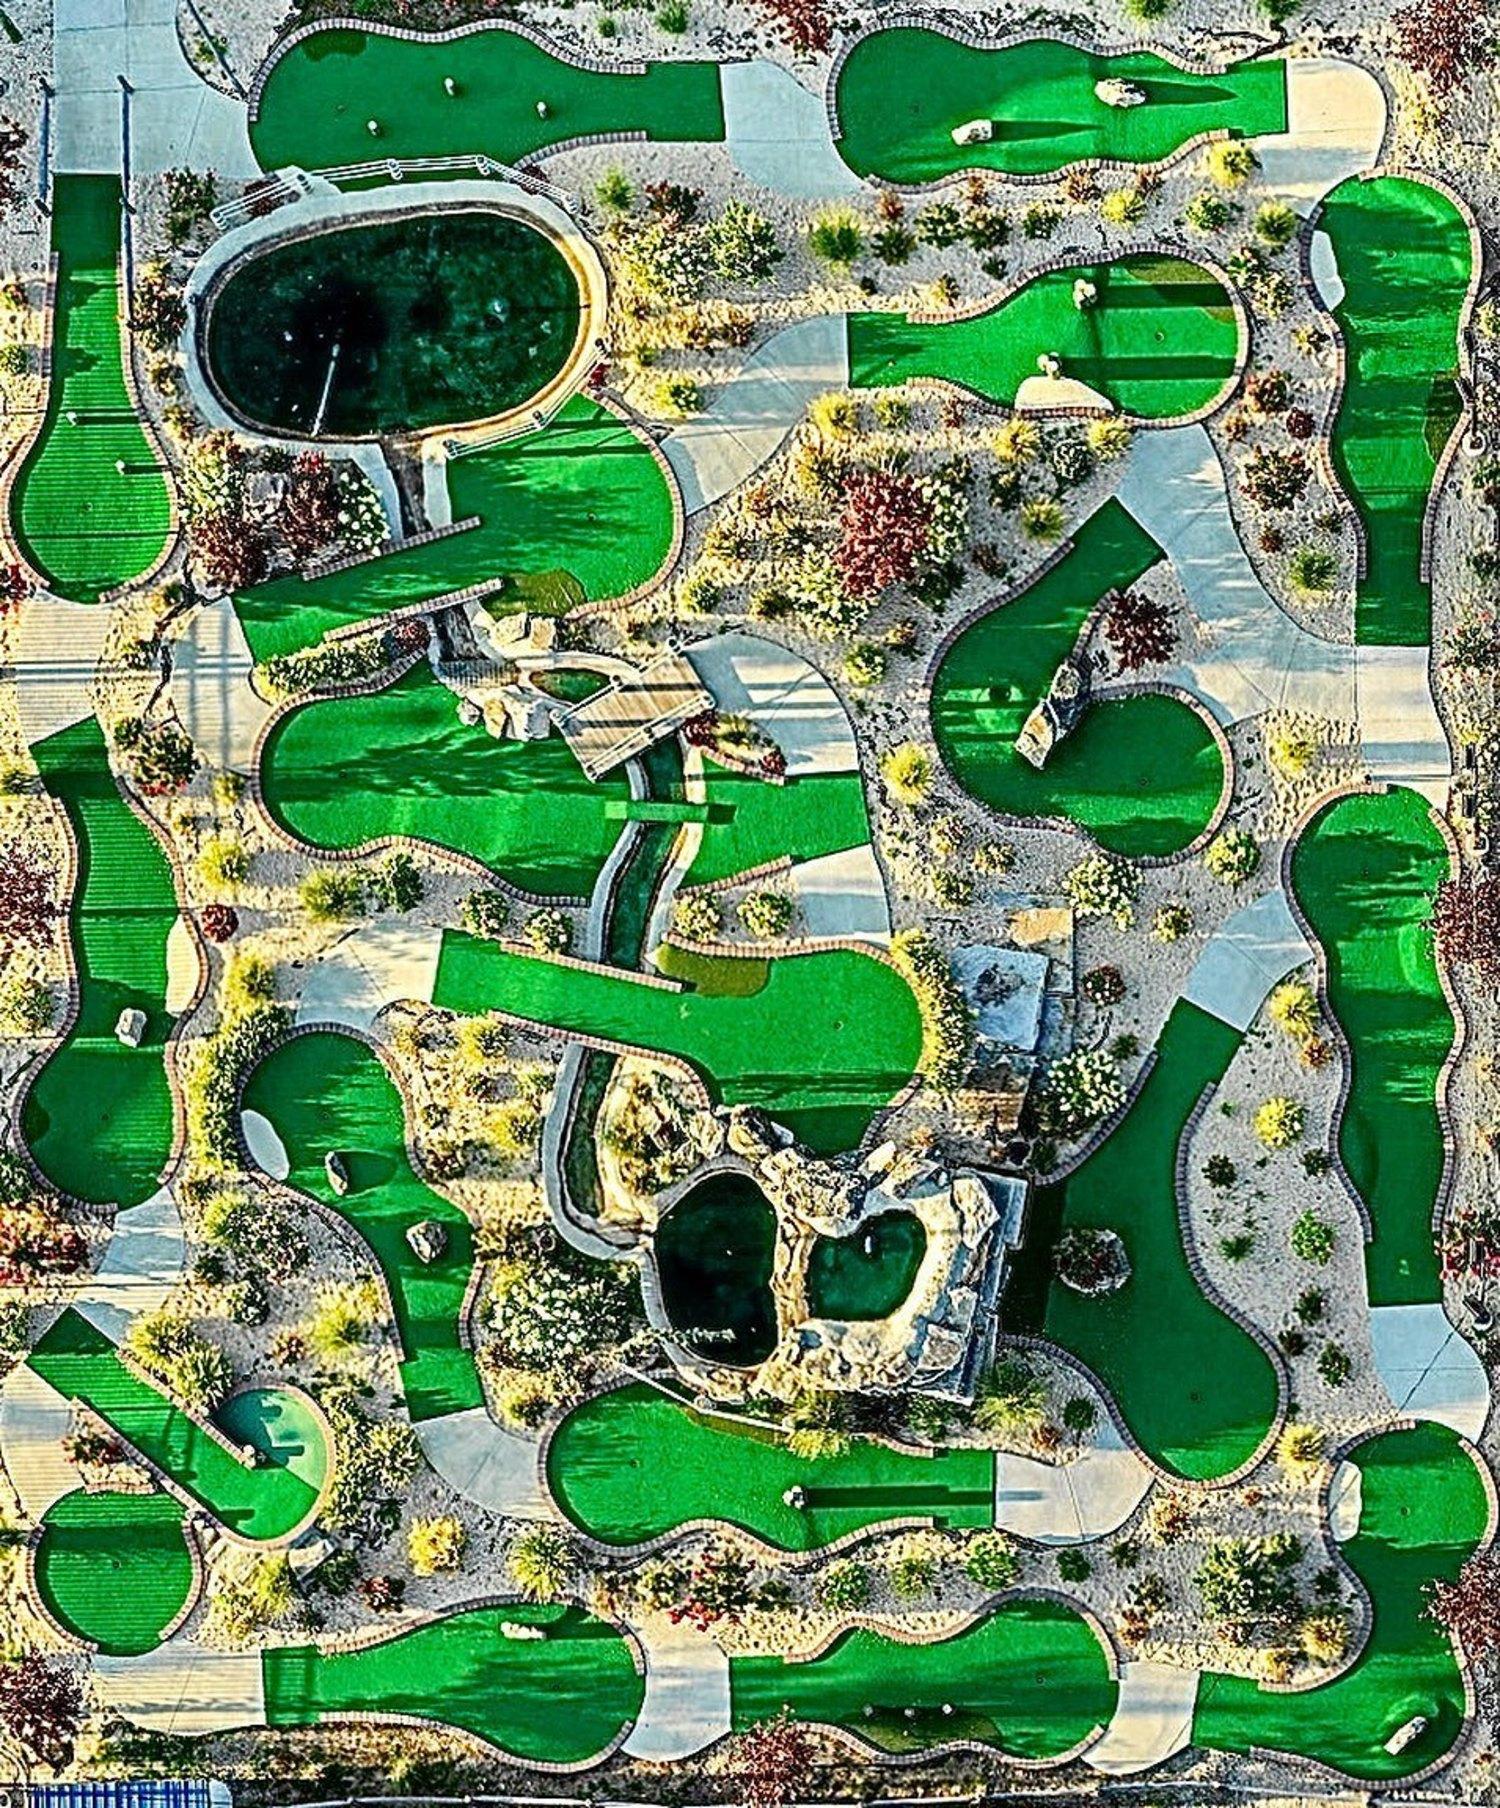 Luna Park Mini Golf, Coney Island, Brooklyn